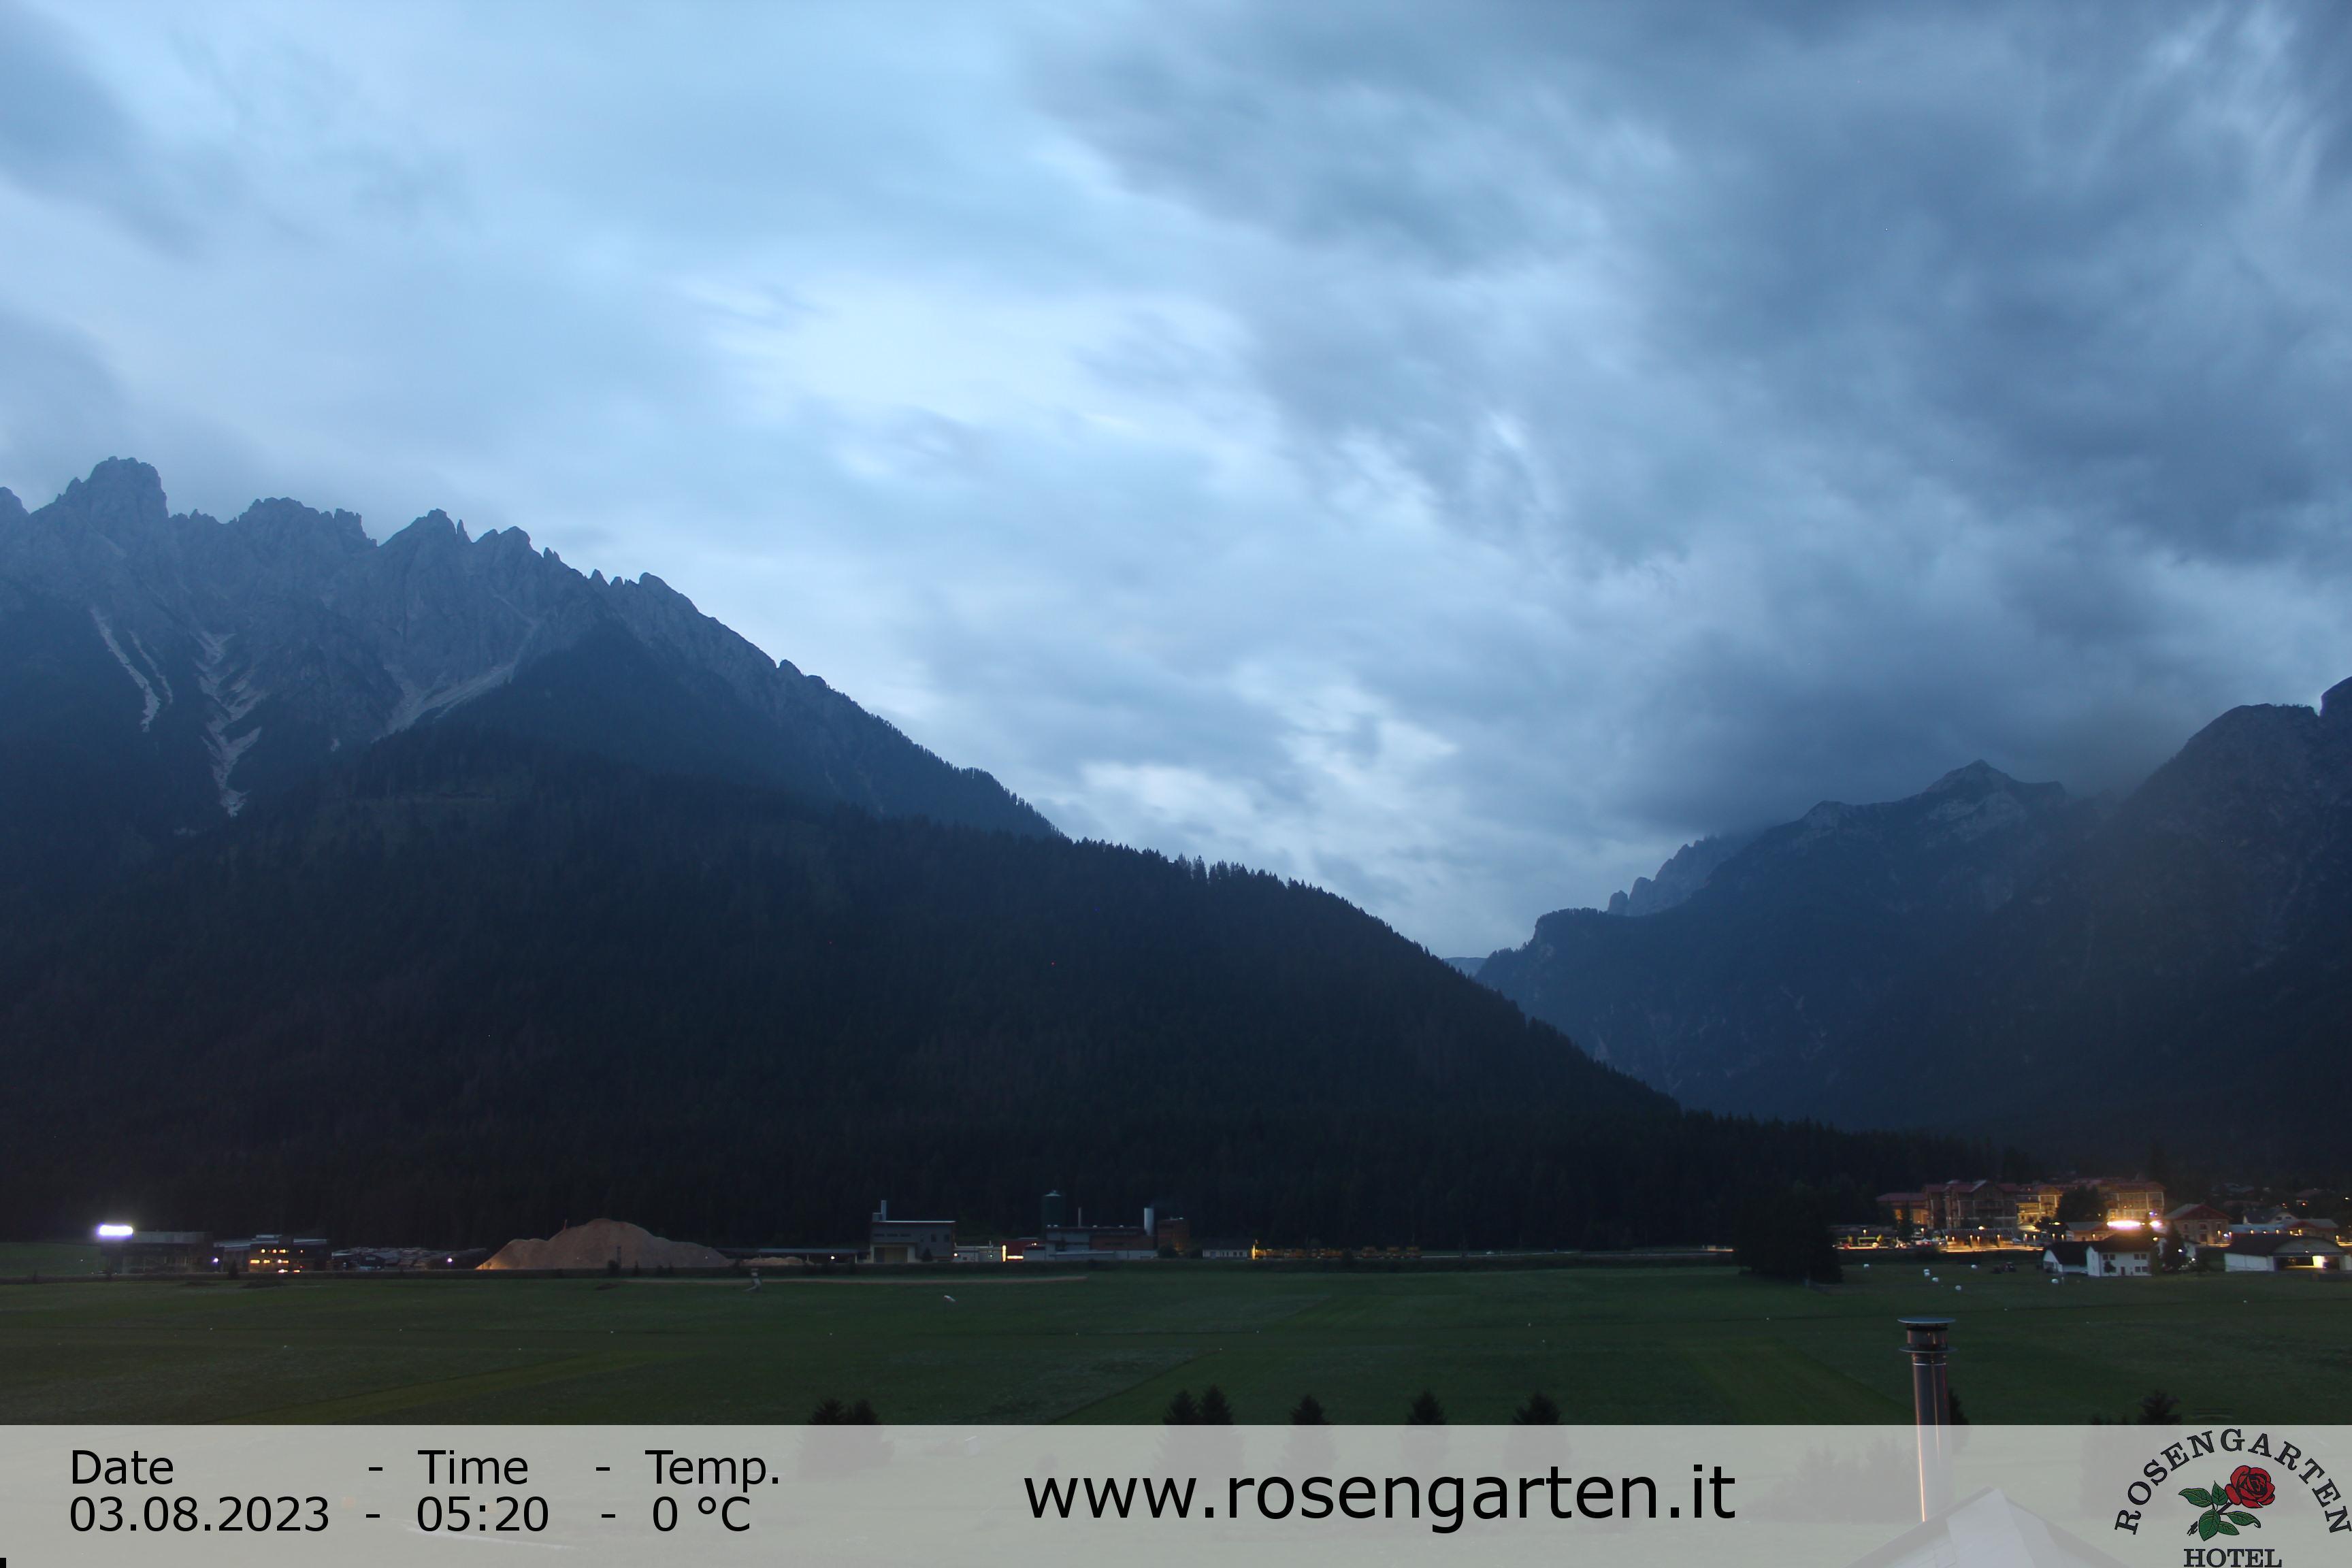 Toblach (Dolomites) - View of the Dolomites